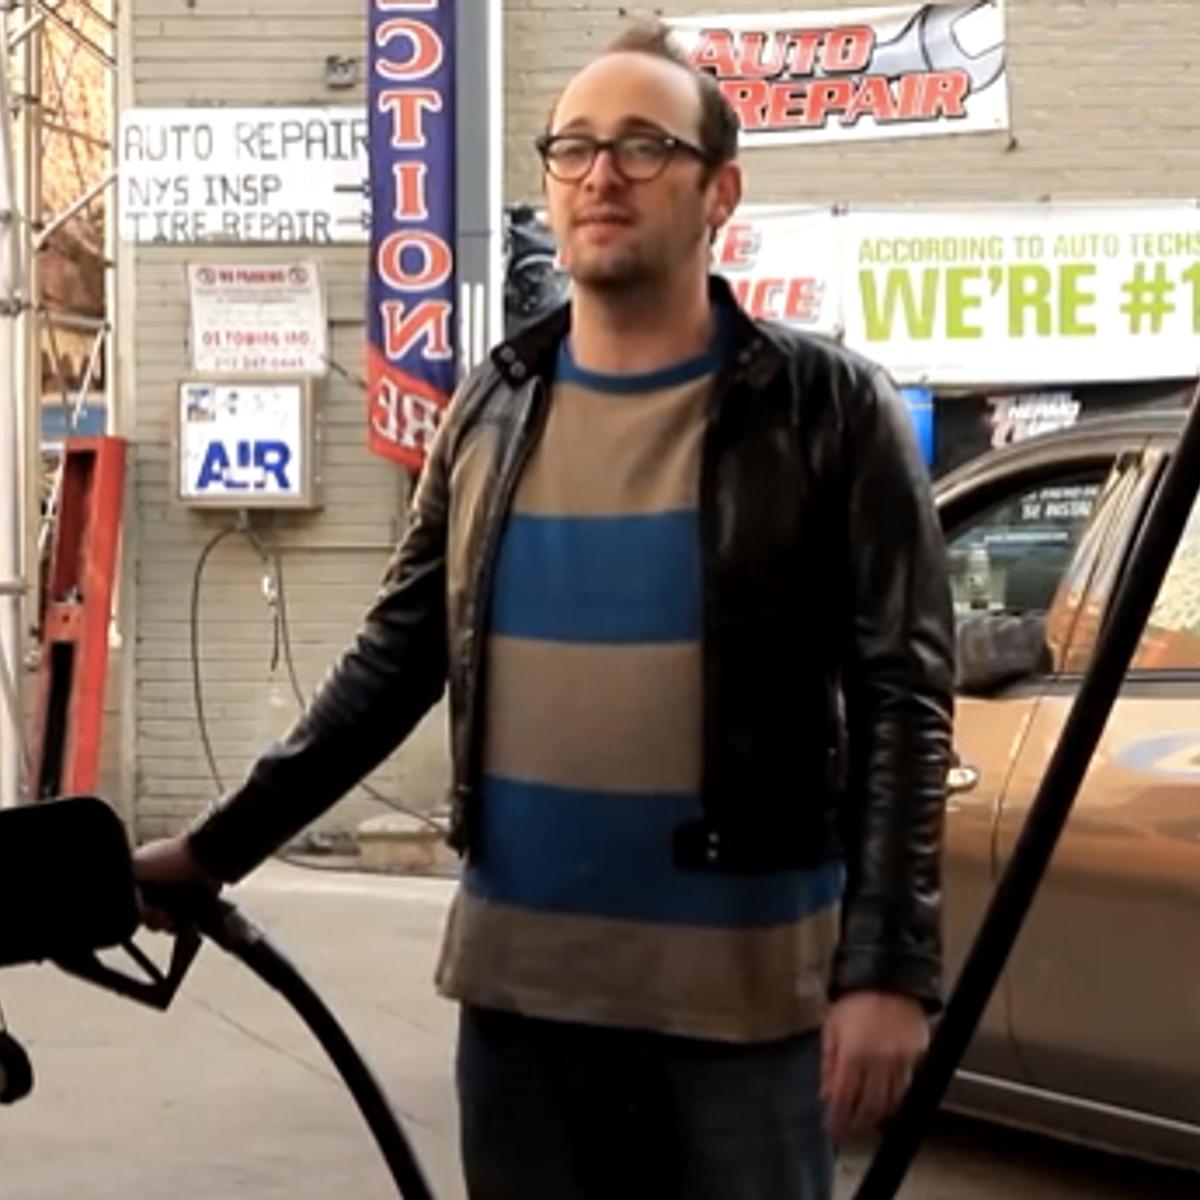 John Oliver's show parodies GOP's ridiculous millennial ads